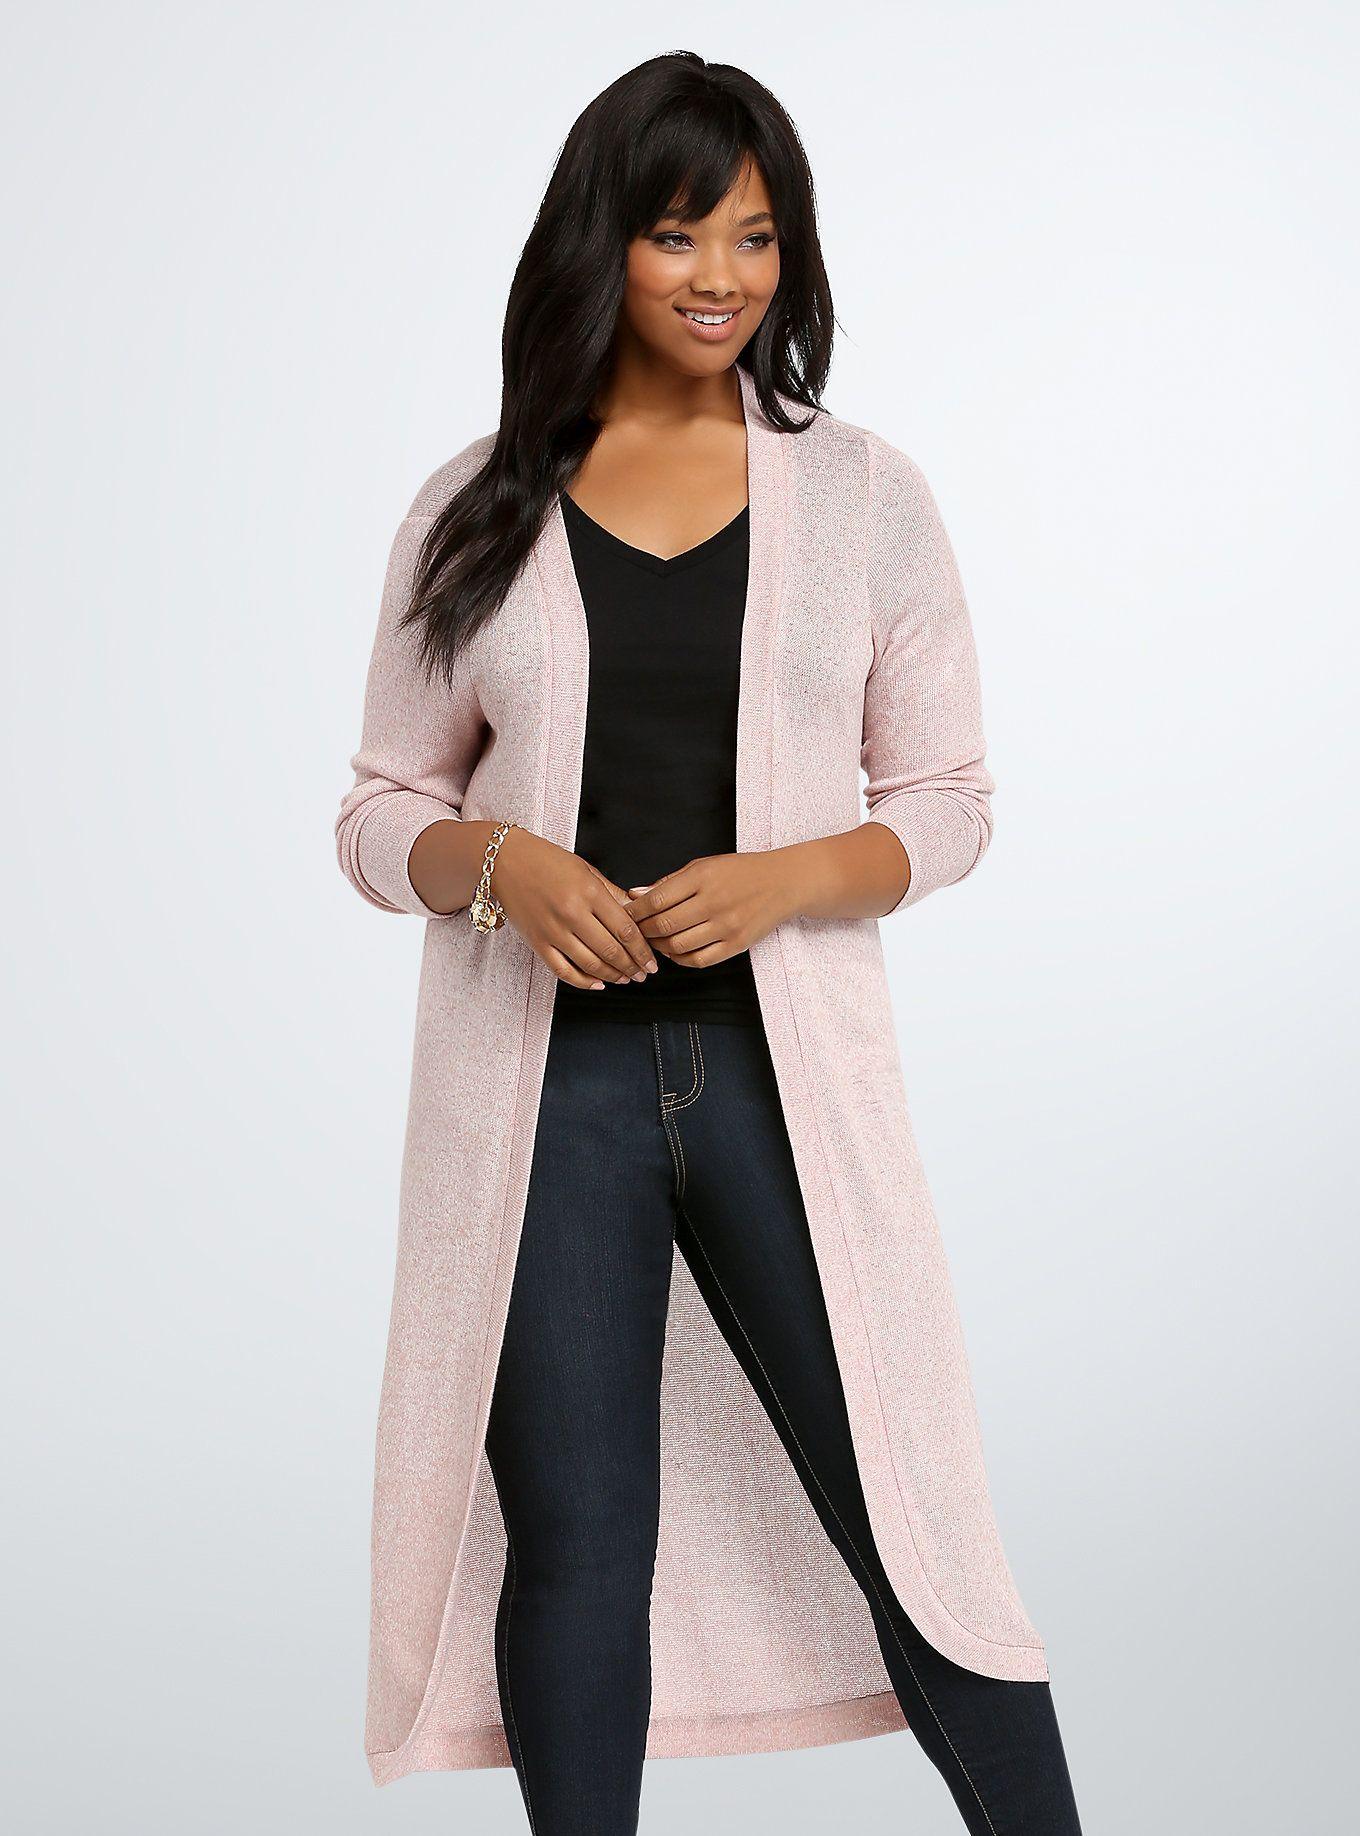 Plus Size Tops for Women: Sexy & Trendy | Torrid | My Closet ...